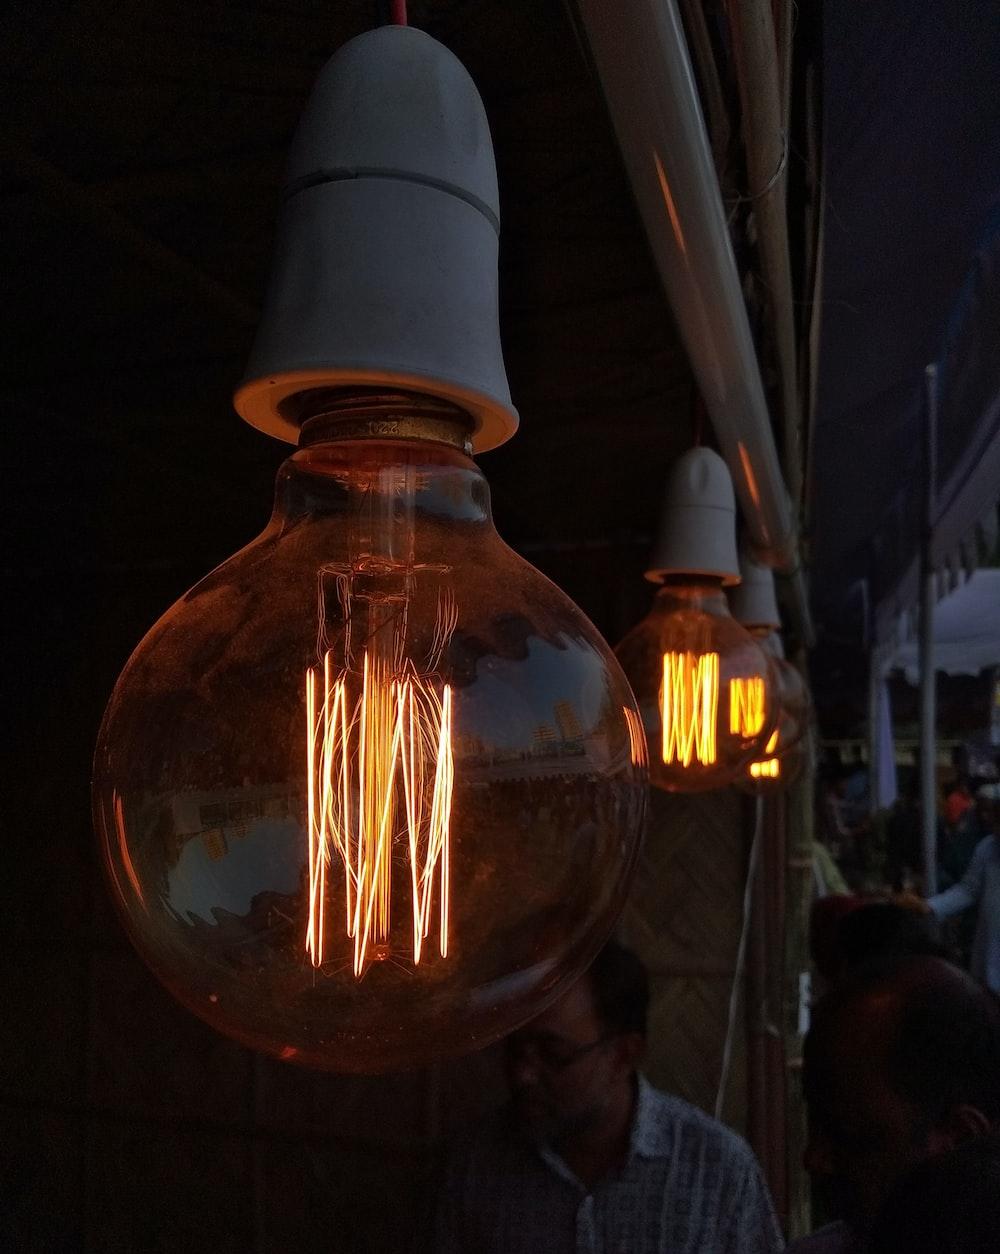 three turned-on filament bulbs